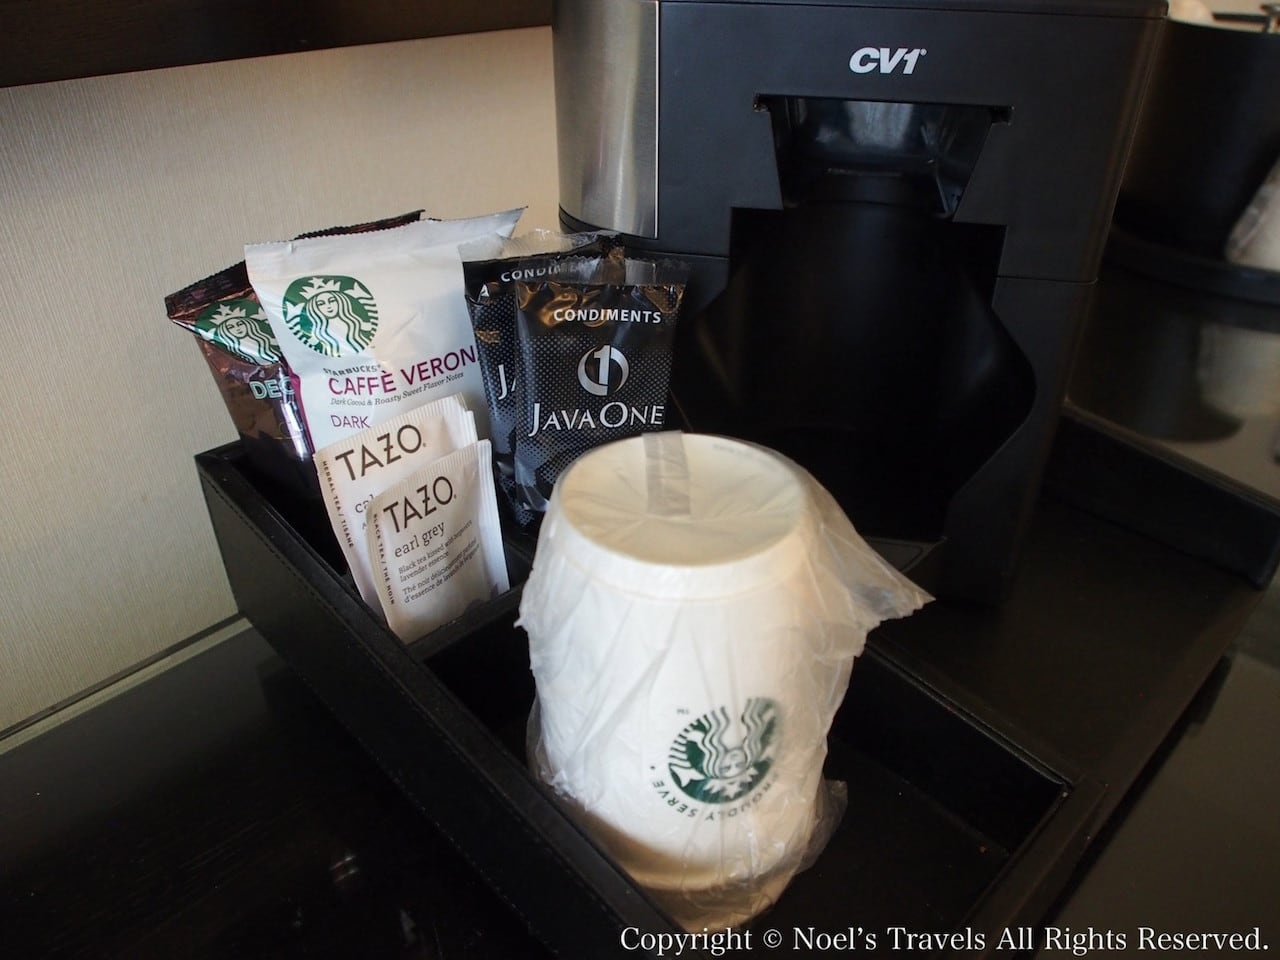 The LA グランドホテル・ダウンタウンのコーヒー